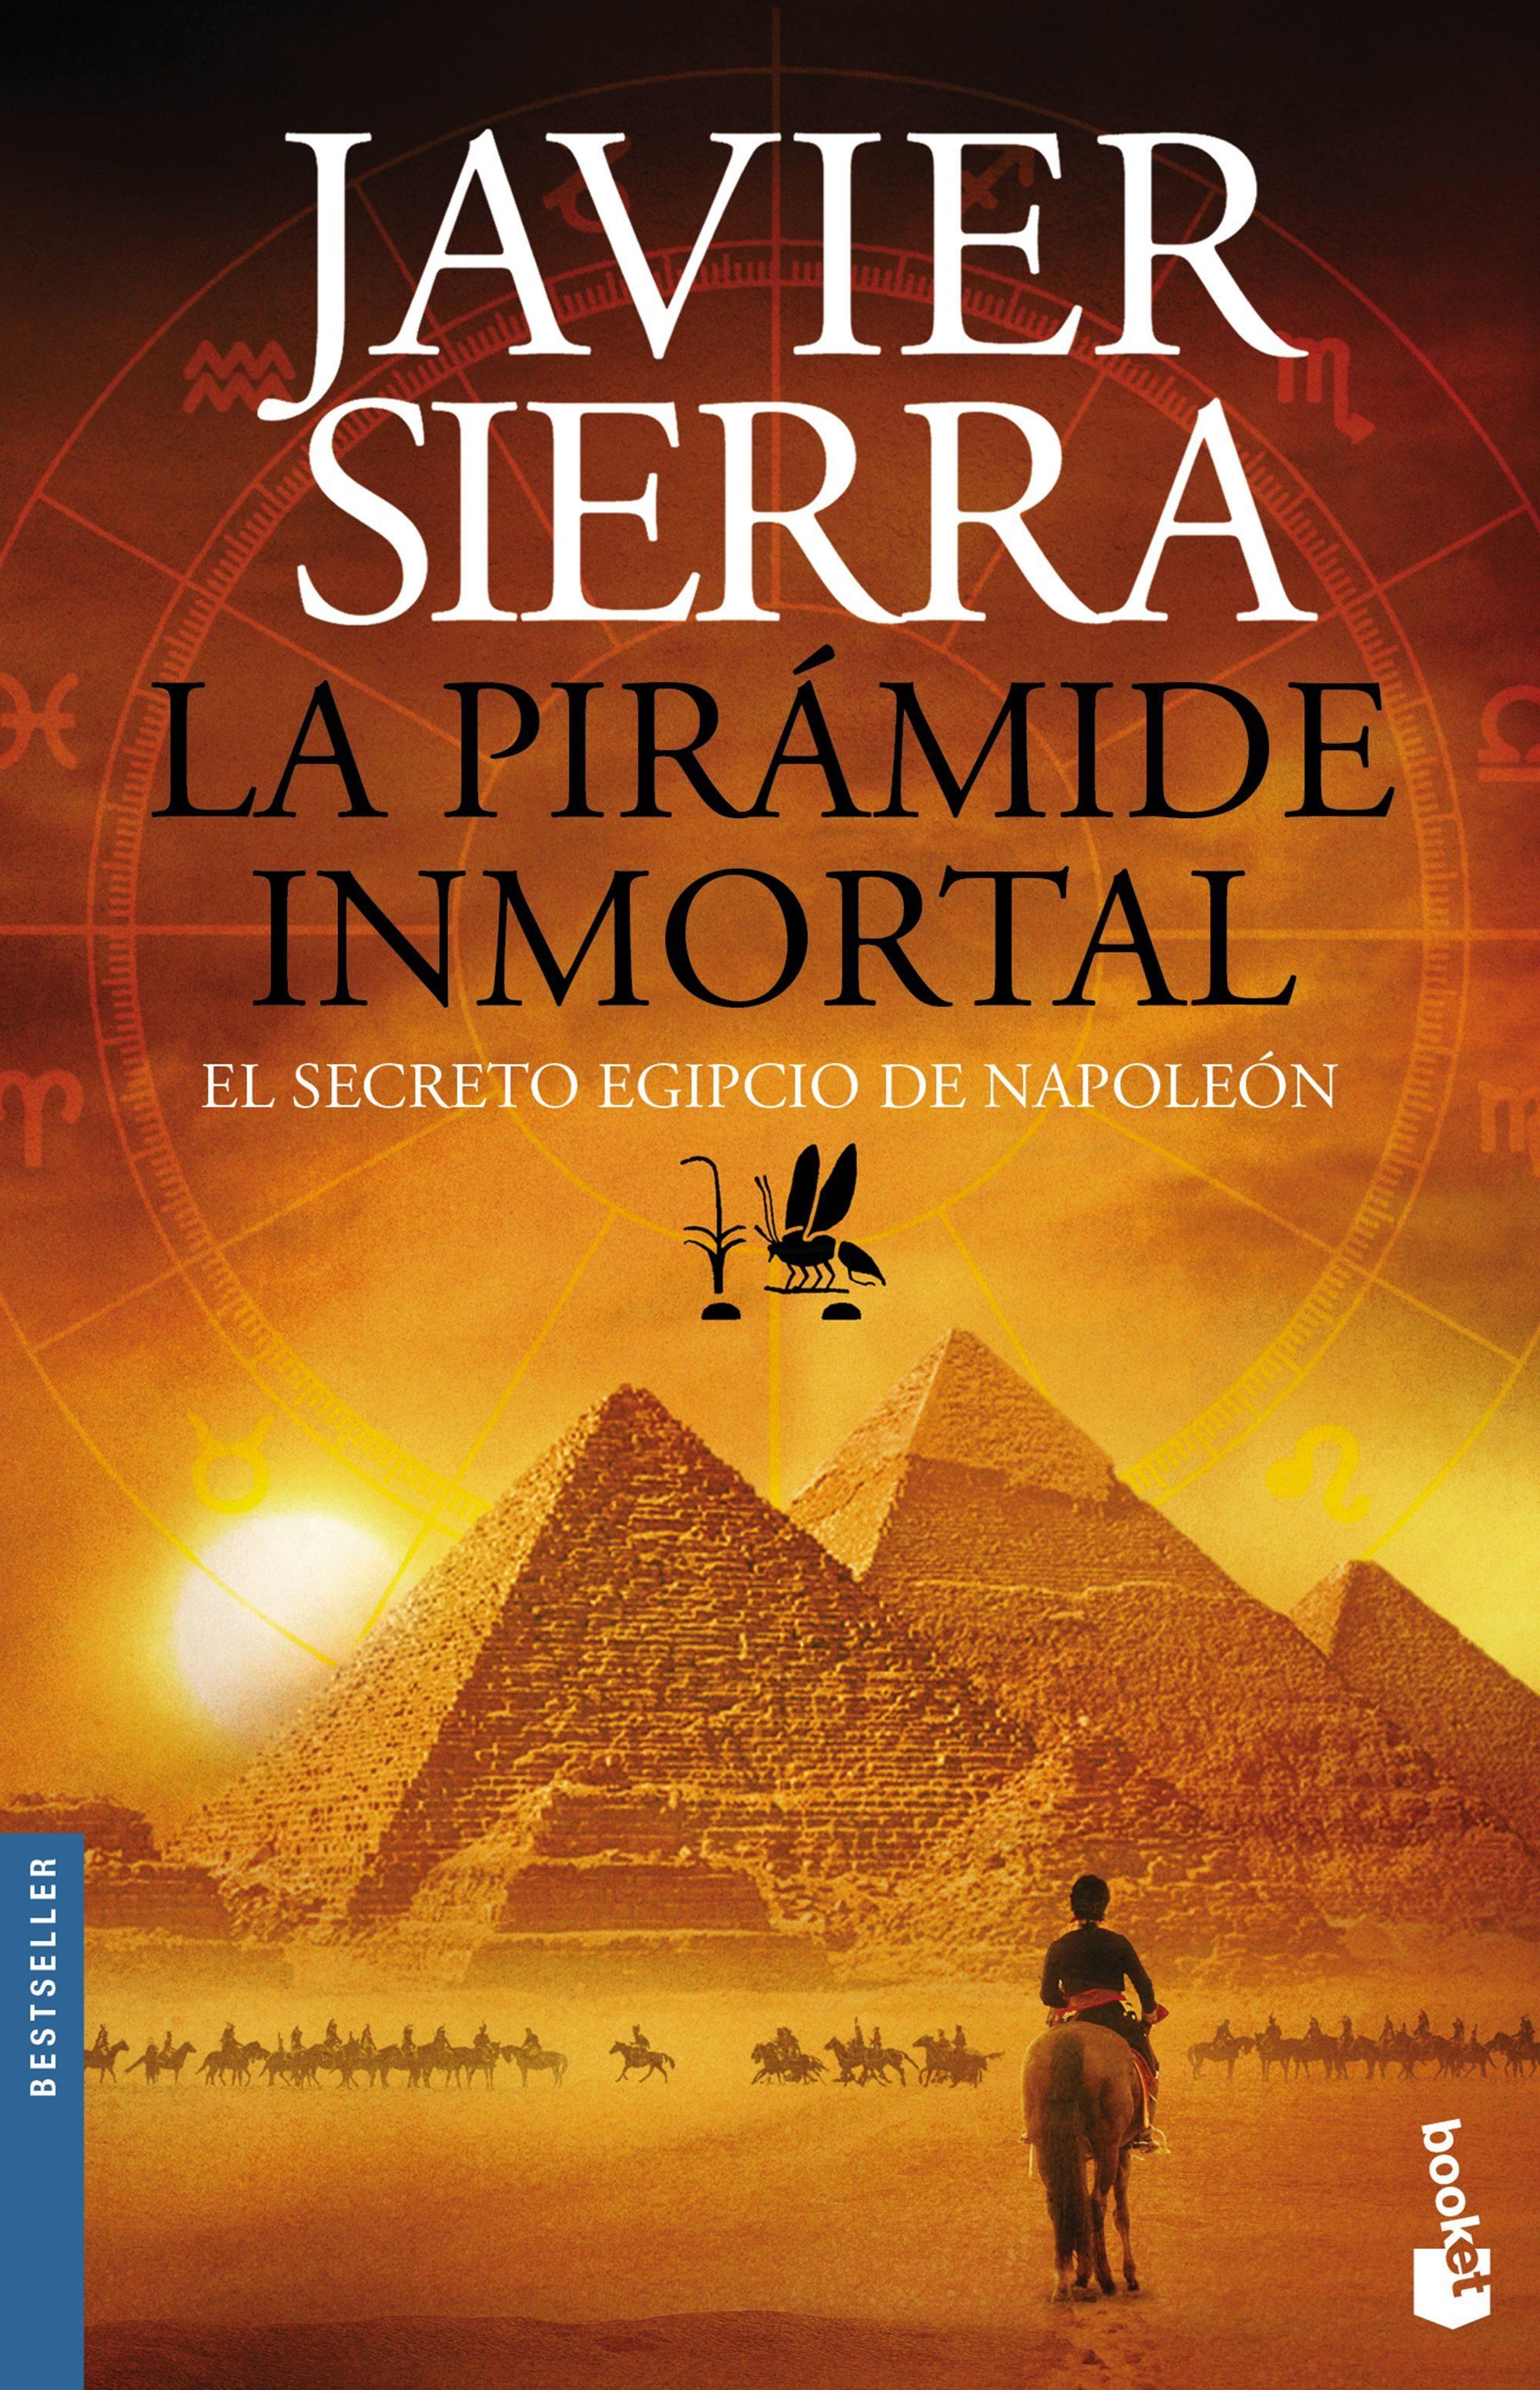 La Pirámide Inmortal: El Secreto Egipcio de Napoleón (Biblioteca Javier Sierra) - Javier Sierra - Booket